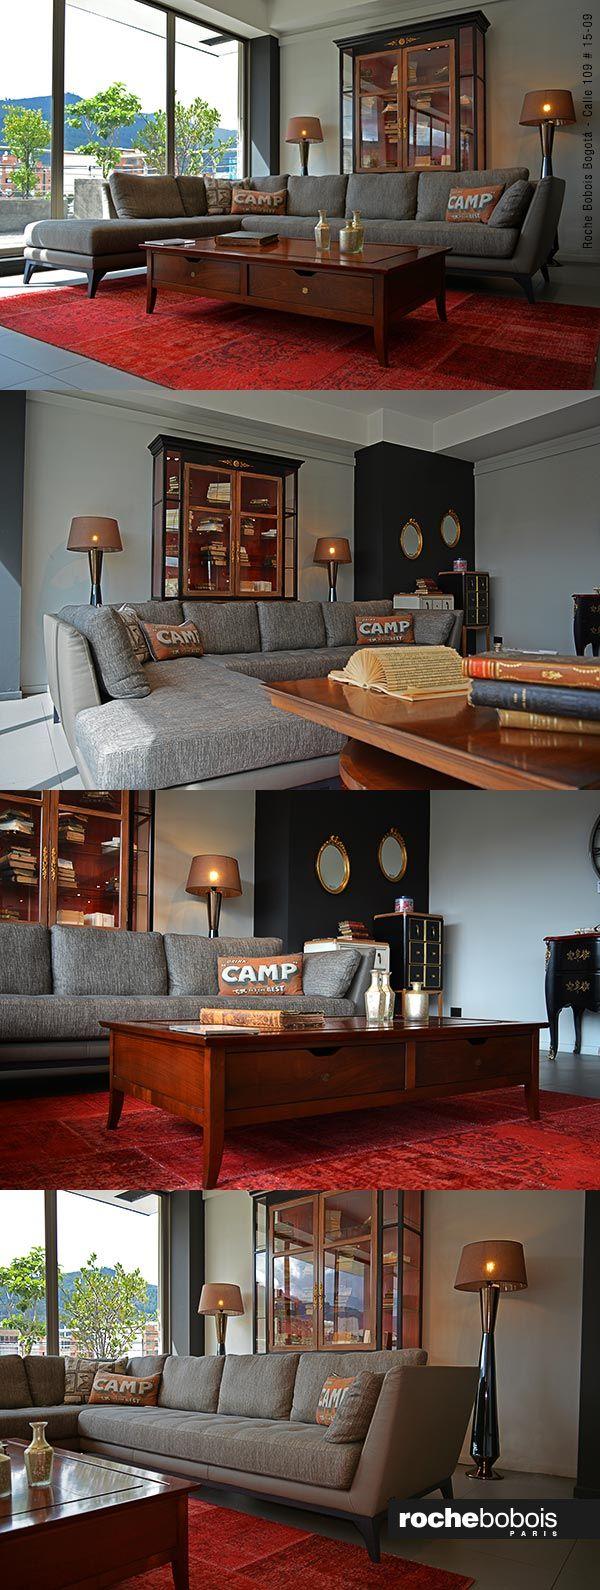 Sala Salasgrandes Salaselegantes Salasgrises Sofa Sofaenl  # Muebles Moon Bogota